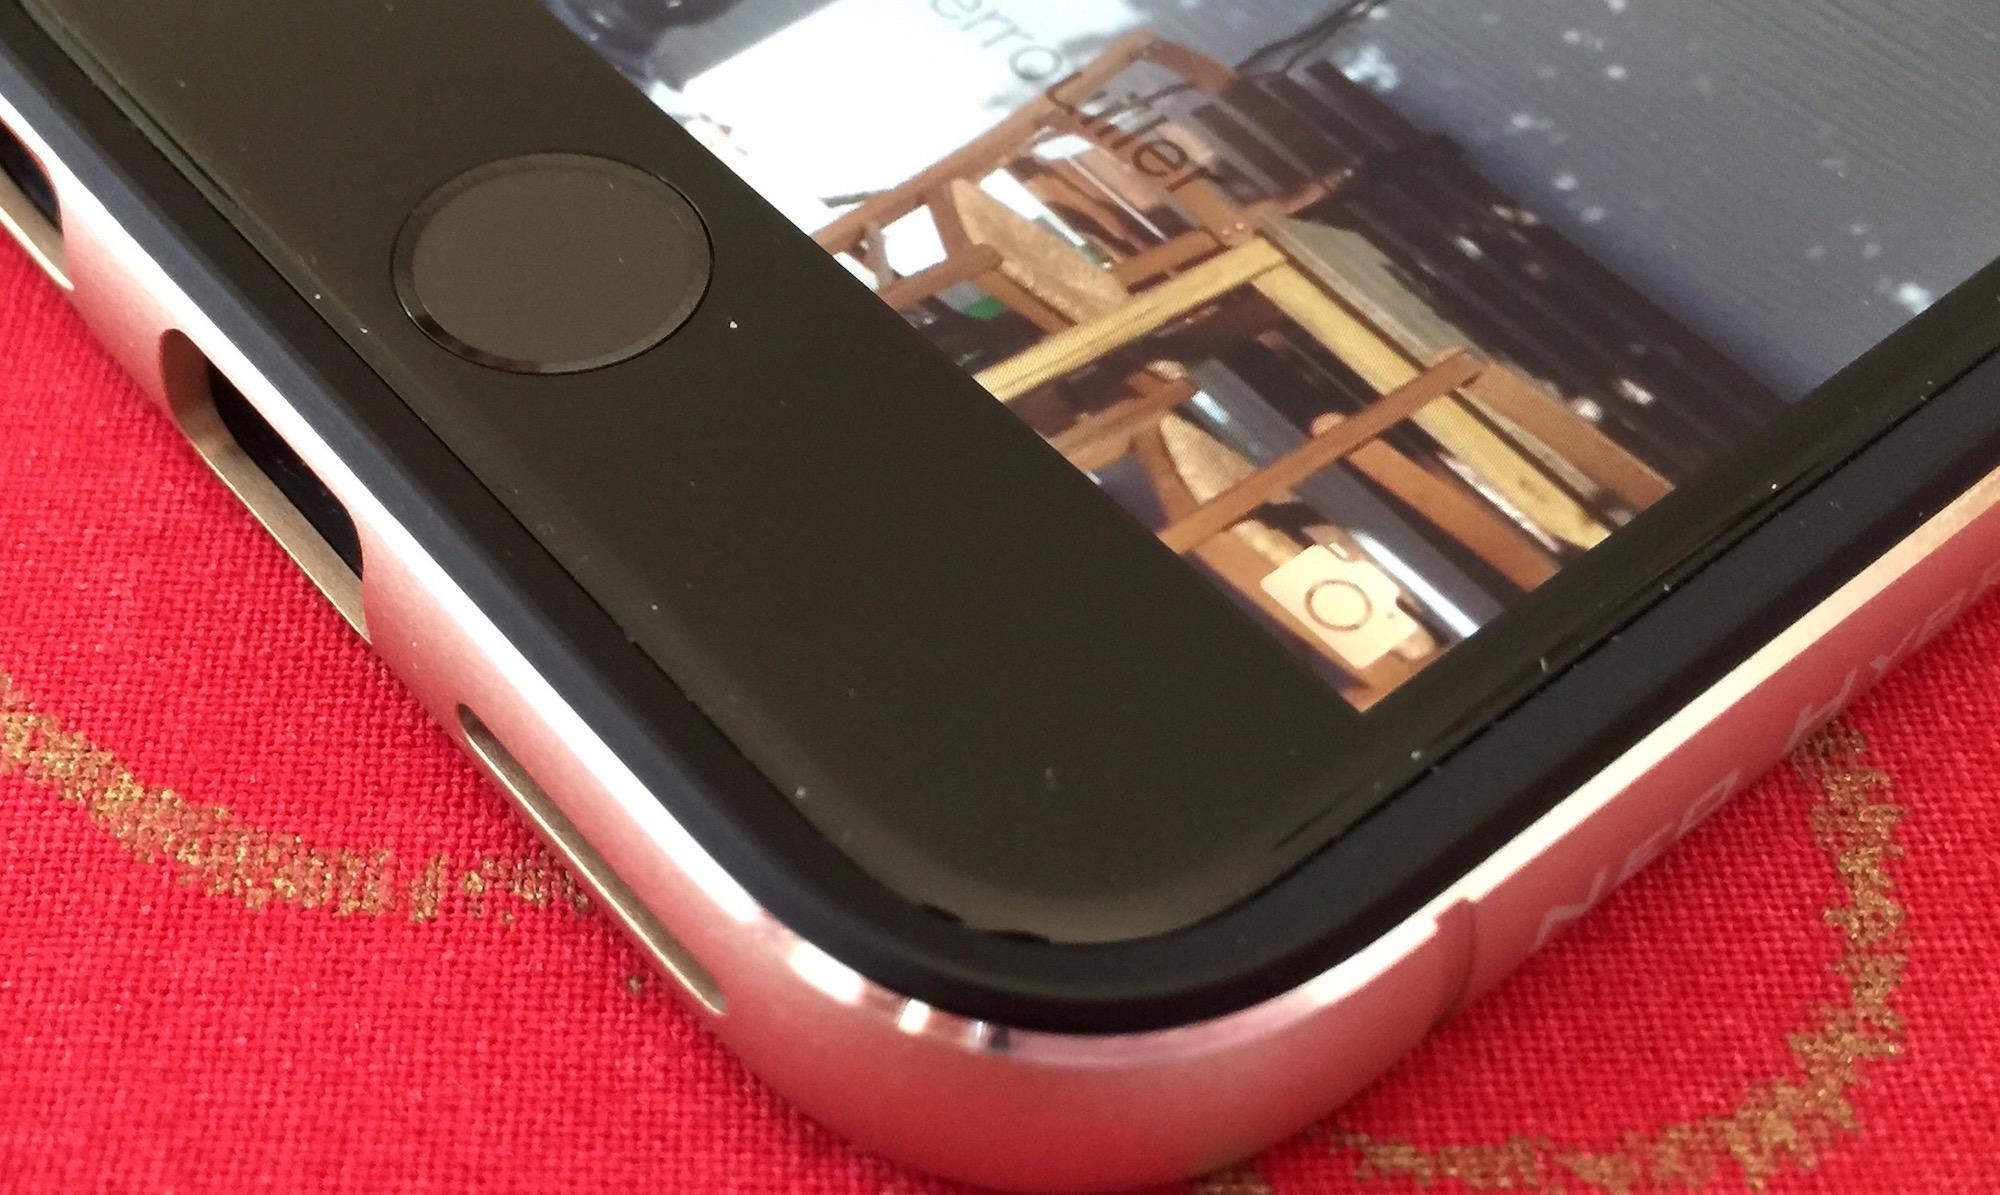 test de la coque iphone 6 et 6 neo hybrid avec bumper alu de spigen. Black Bedroom Furniture Sets. Home Design Ideas